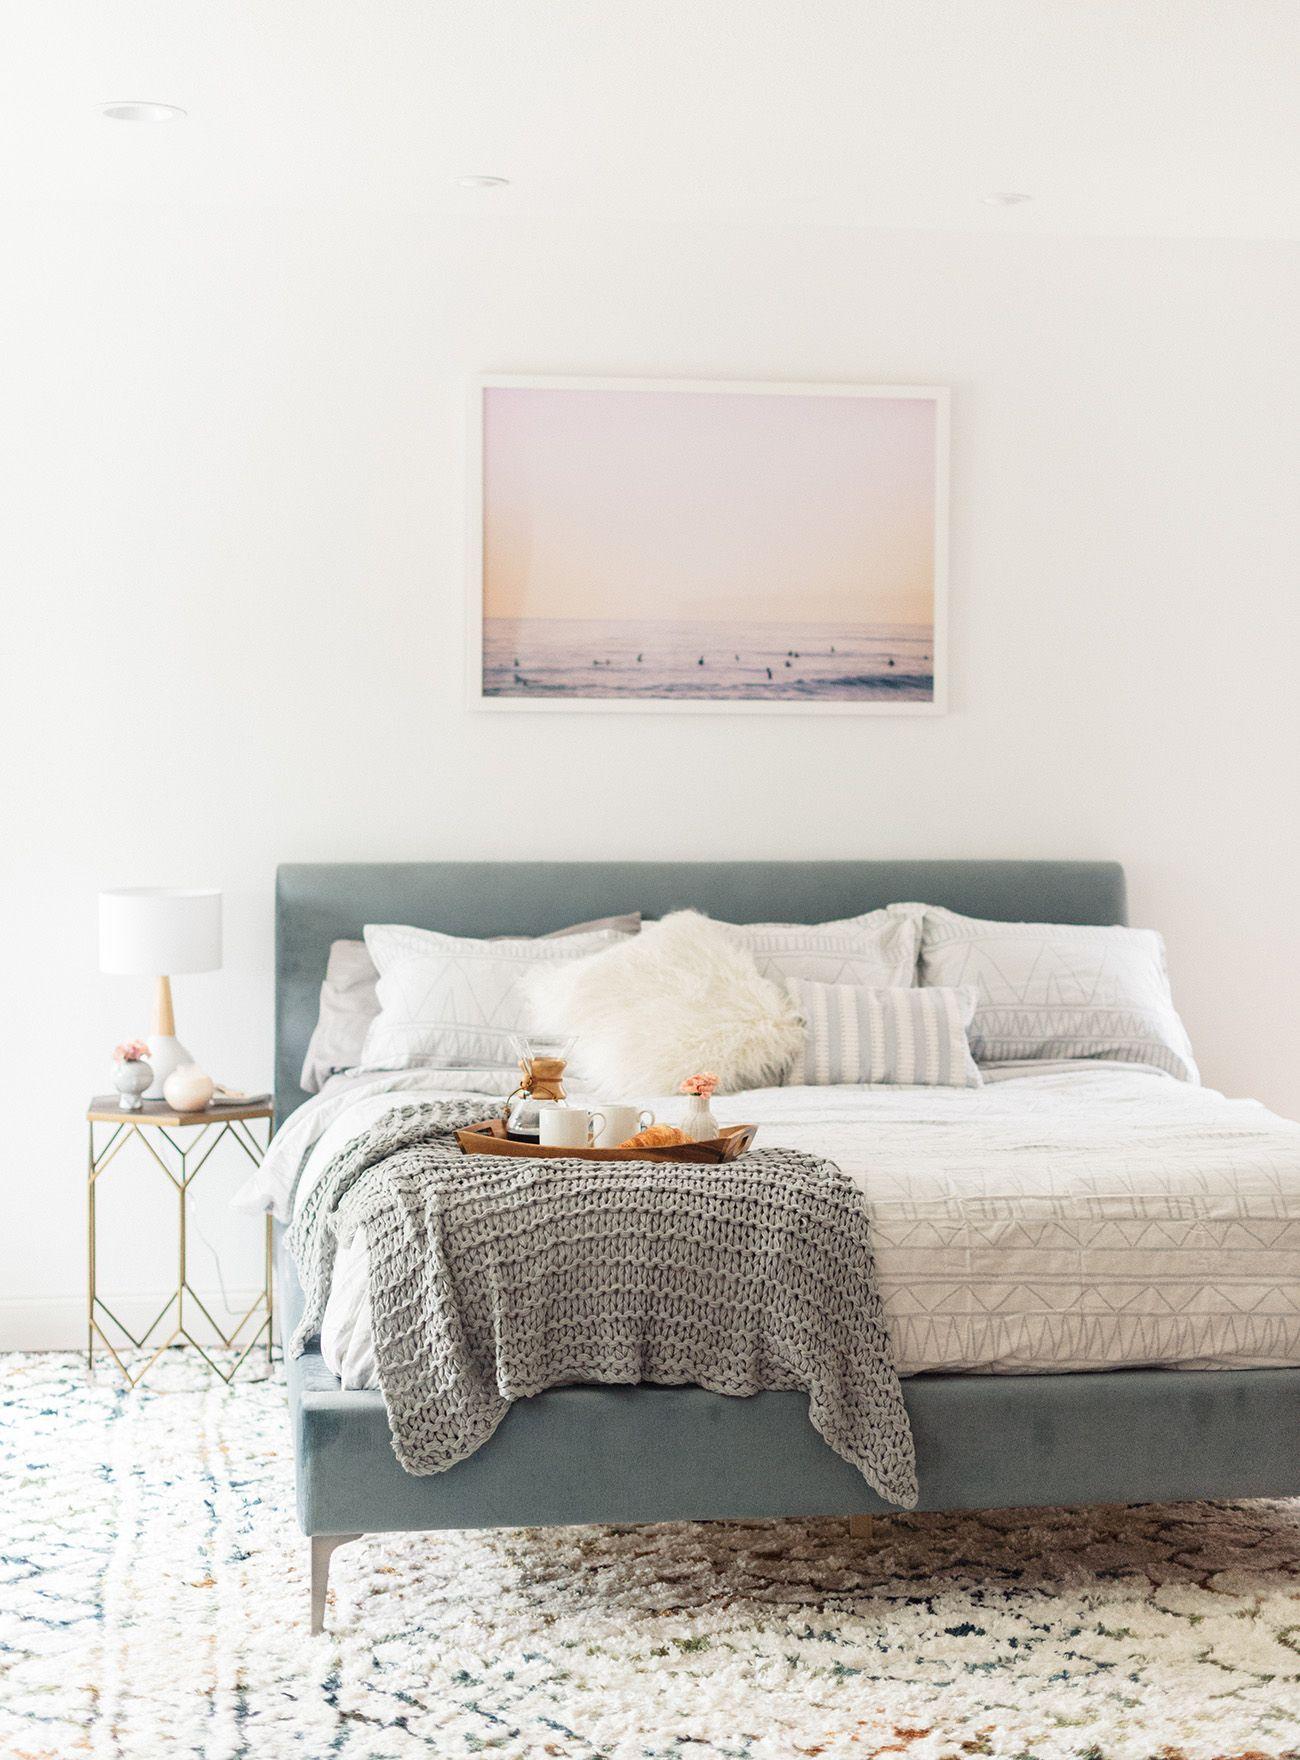 bedroom illustration minimal rendering depositphotos wood photo yellow bed sofa wall interior stock design